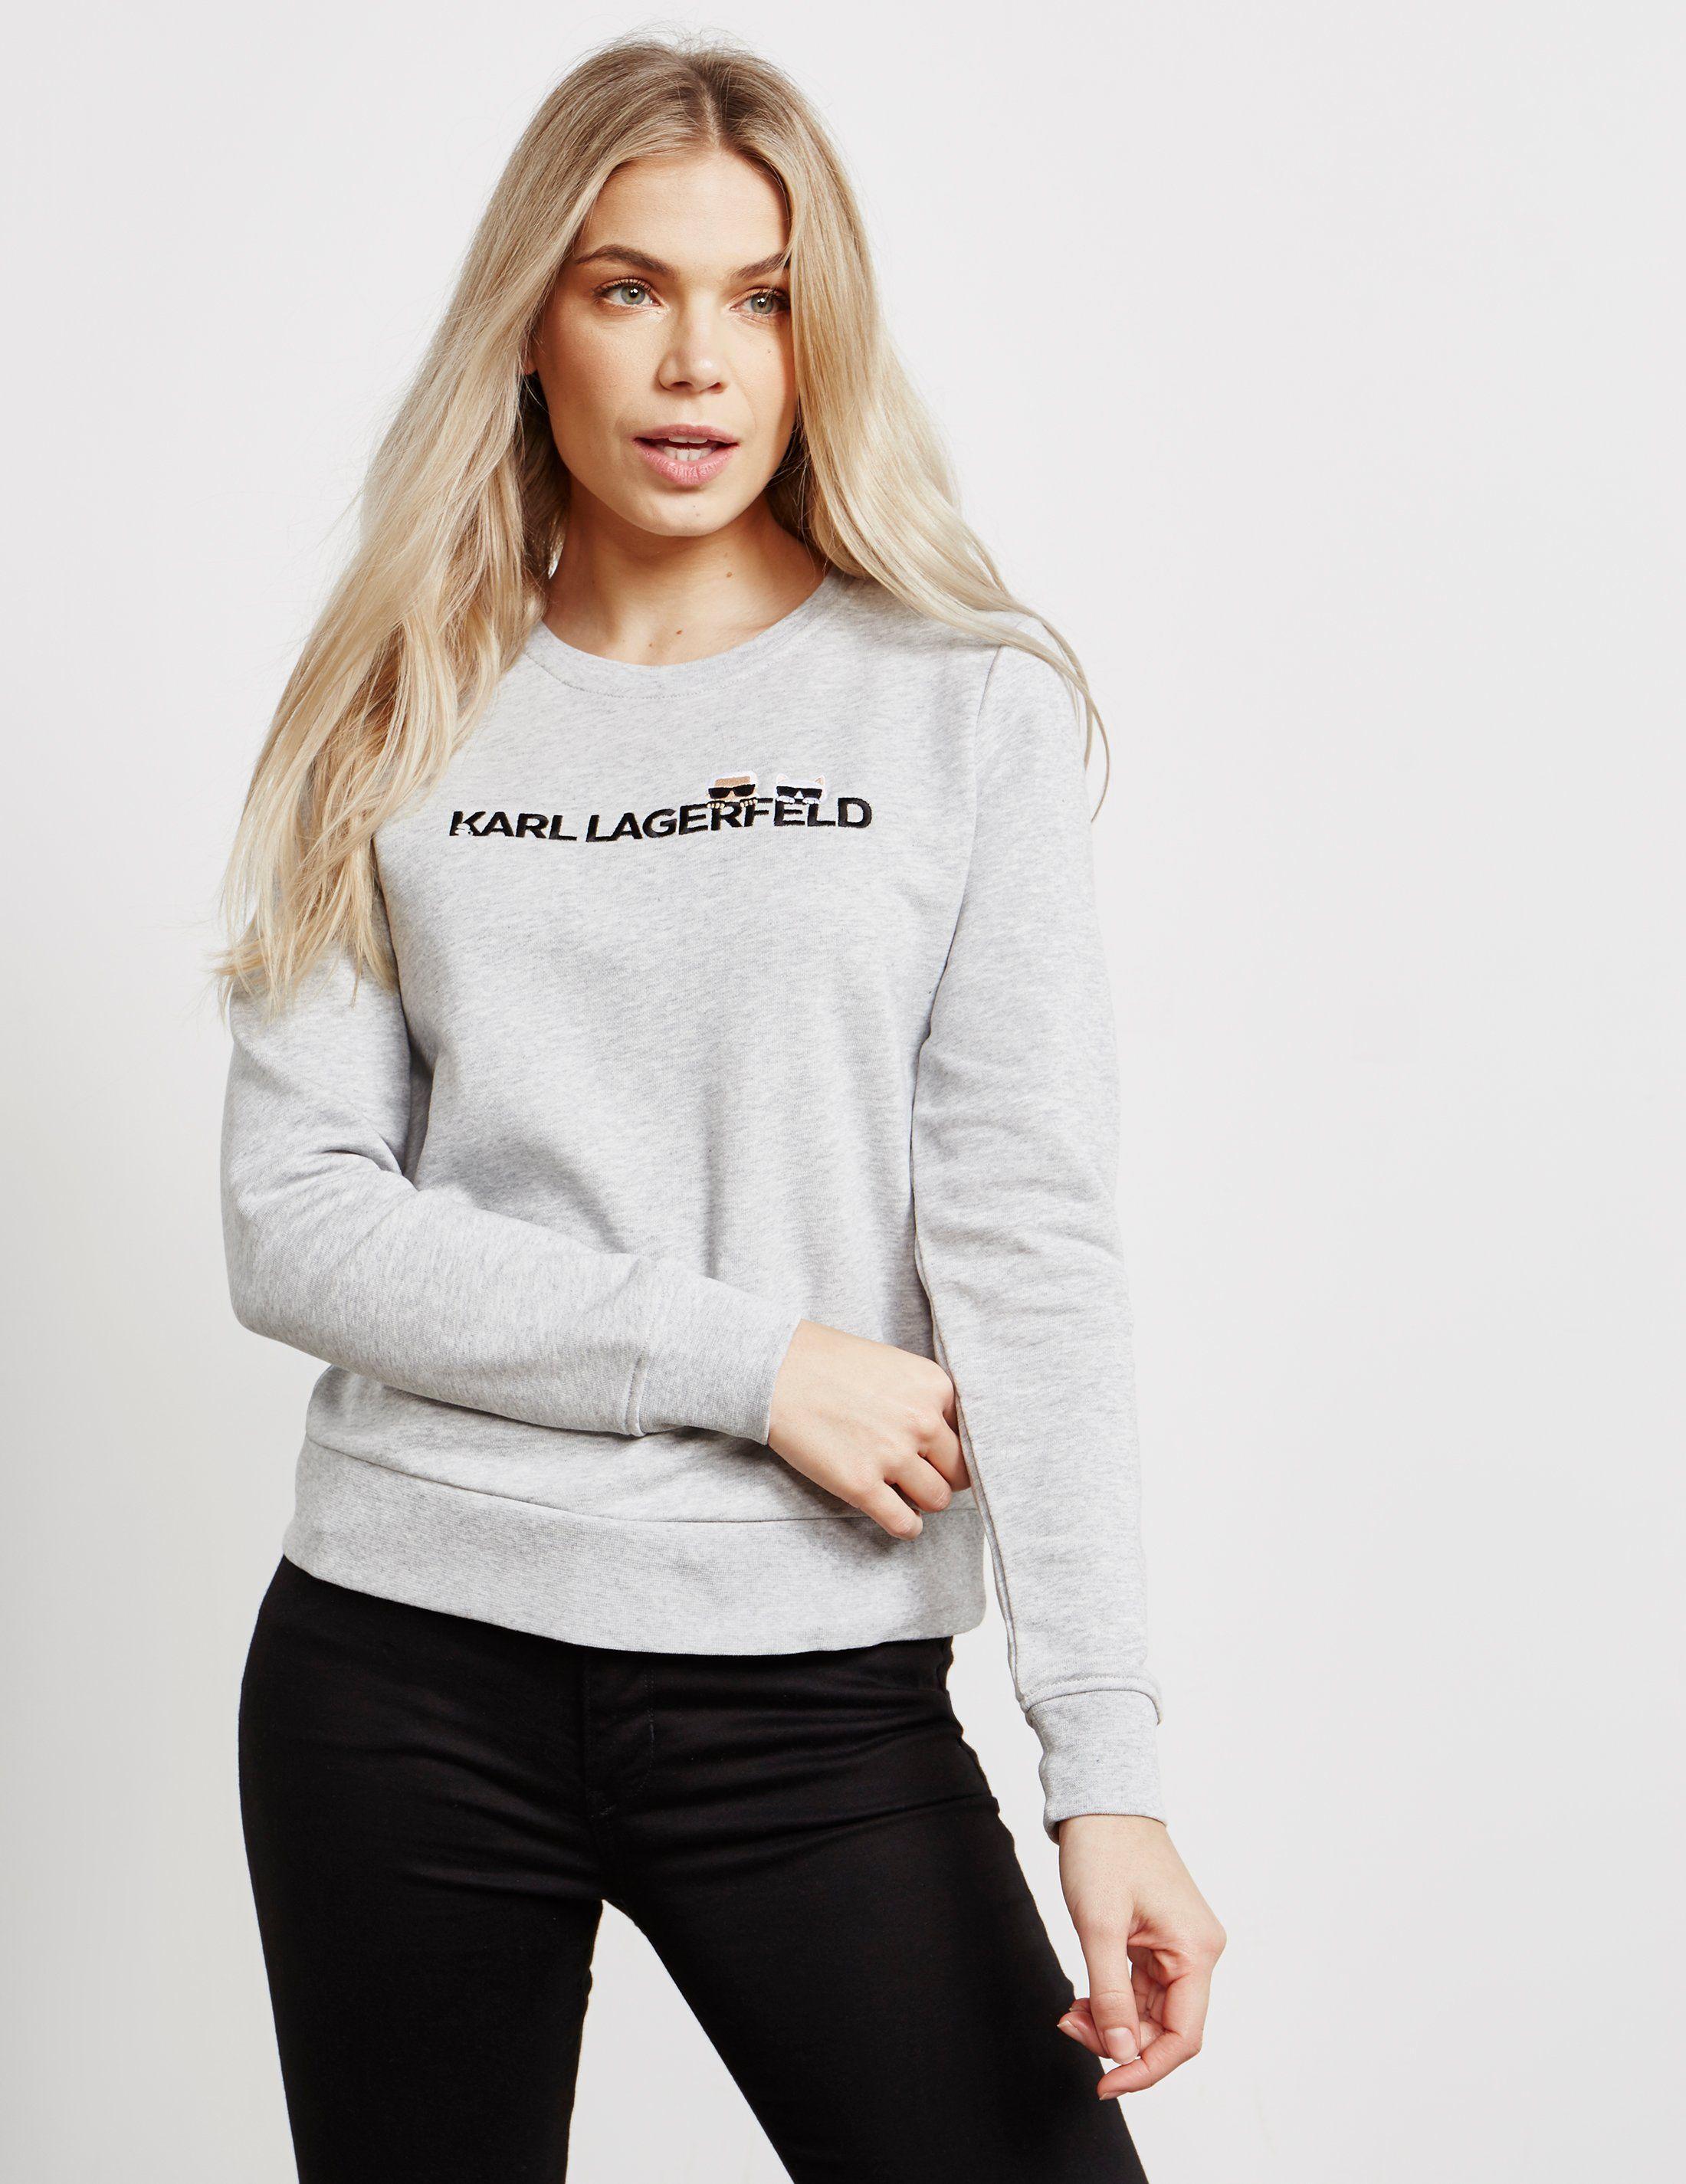 Karl Lagerfeld Ikon Logo Sweatshirt